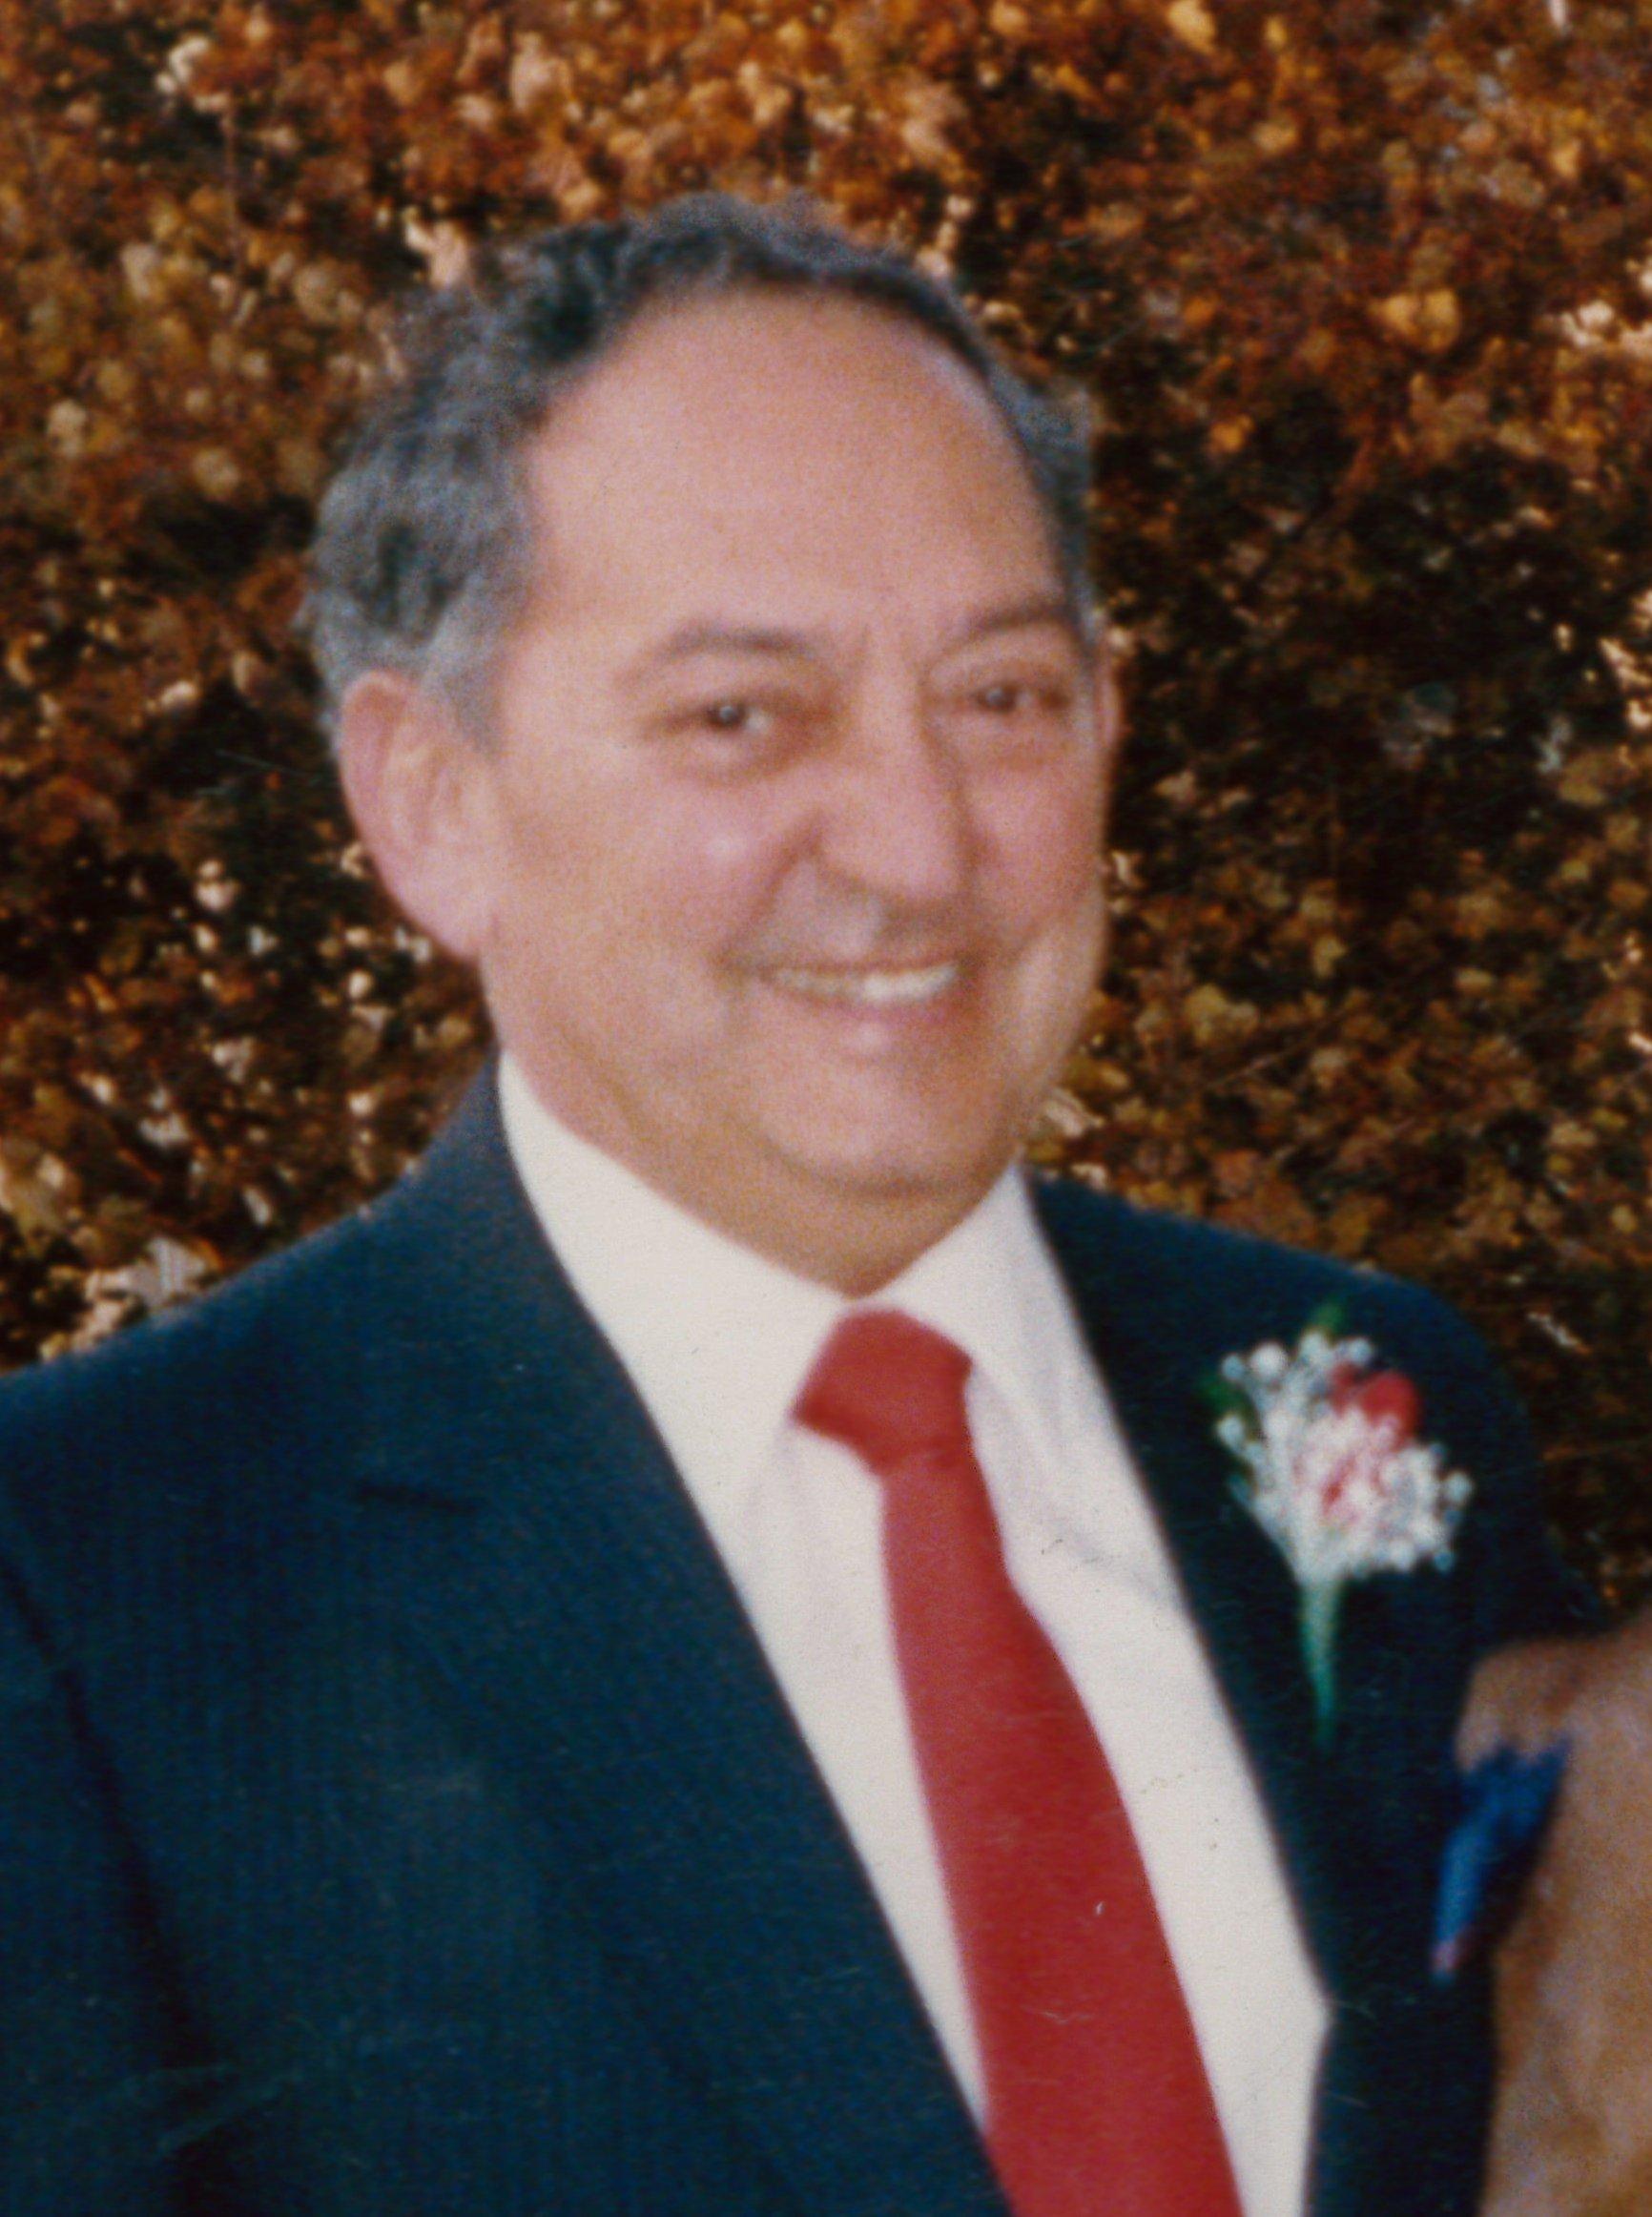 Joseph Spalluto